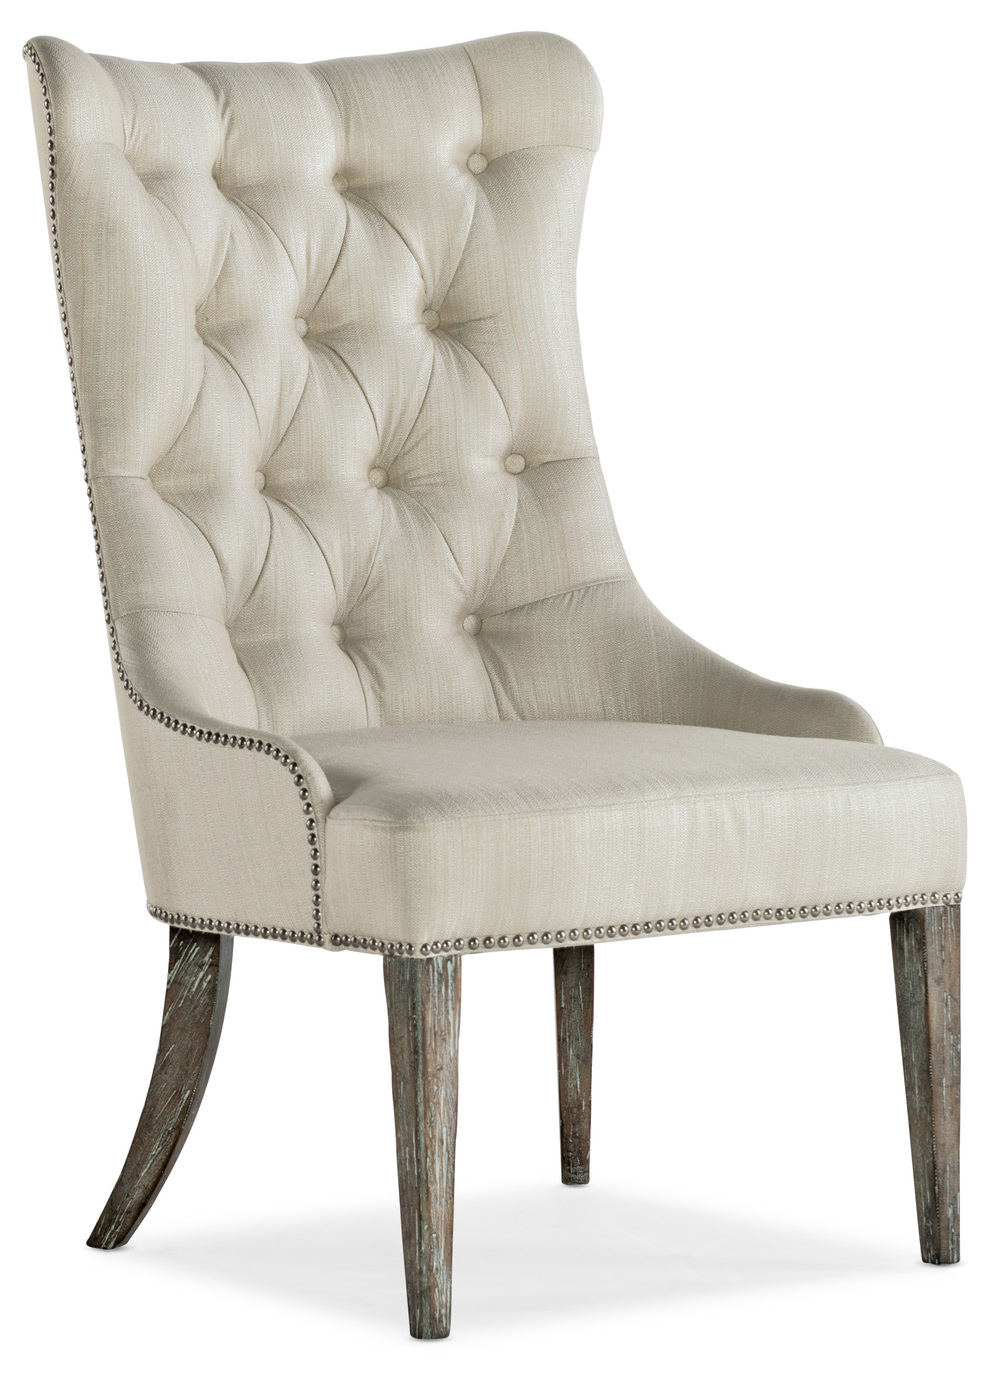 Hooker Furniture - Hostess Upholstered Chair